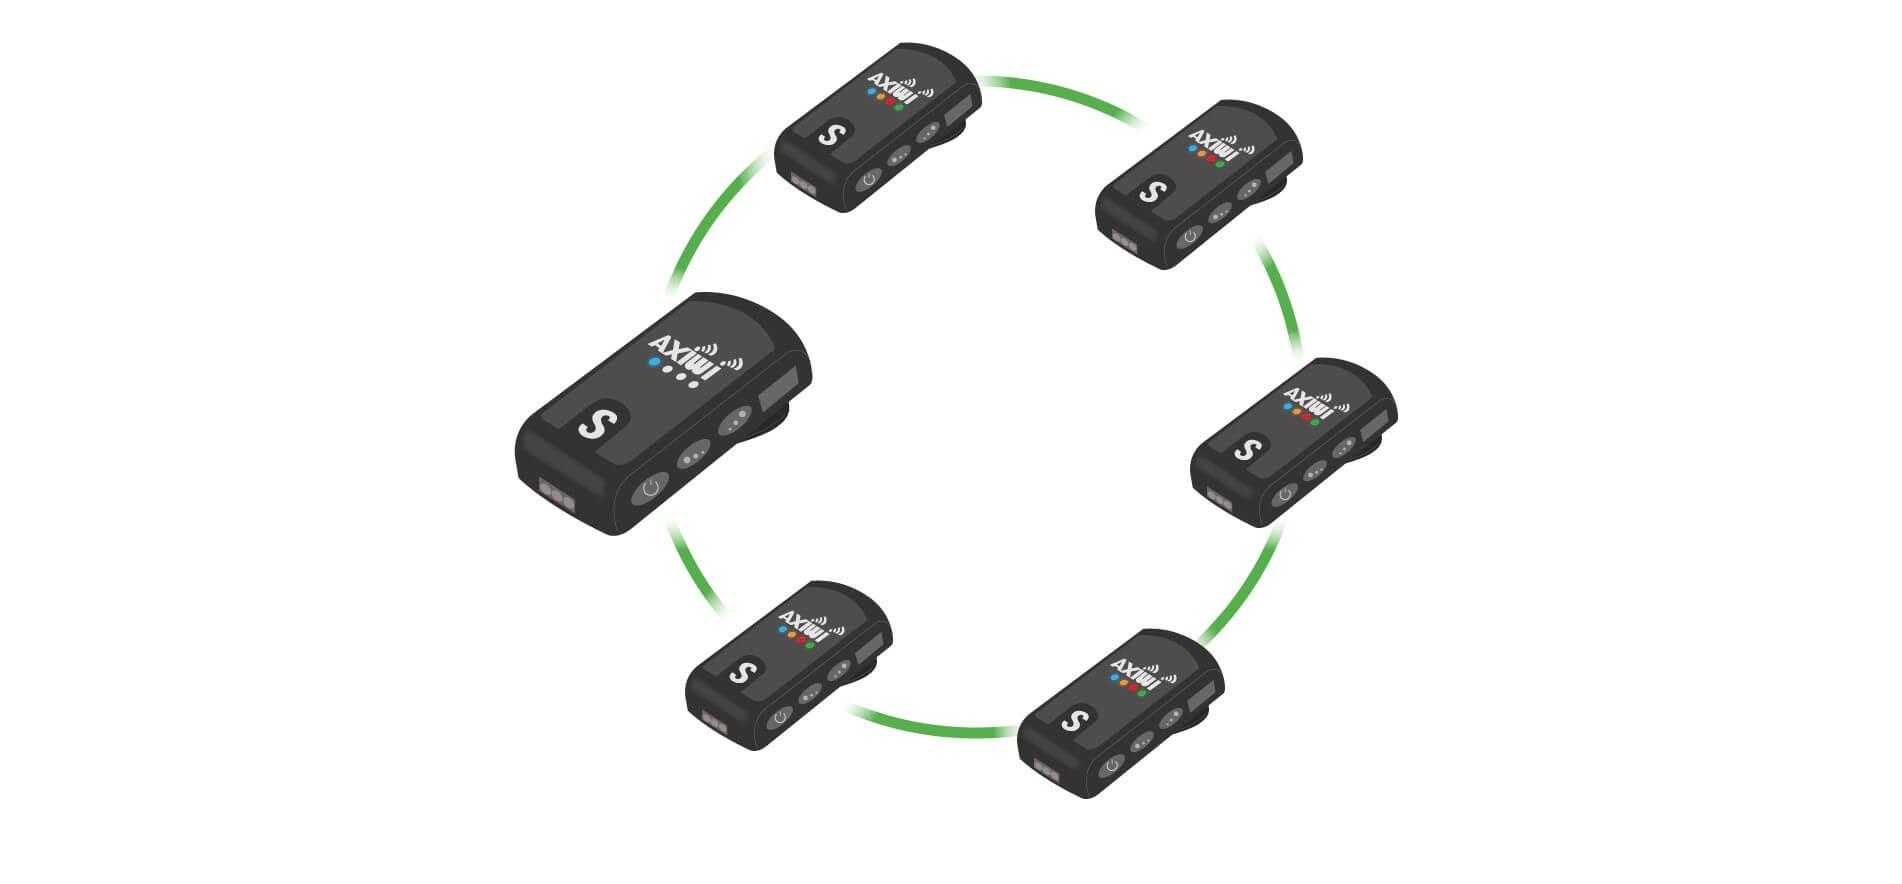 axiwi-duplex-communicatiesysteem